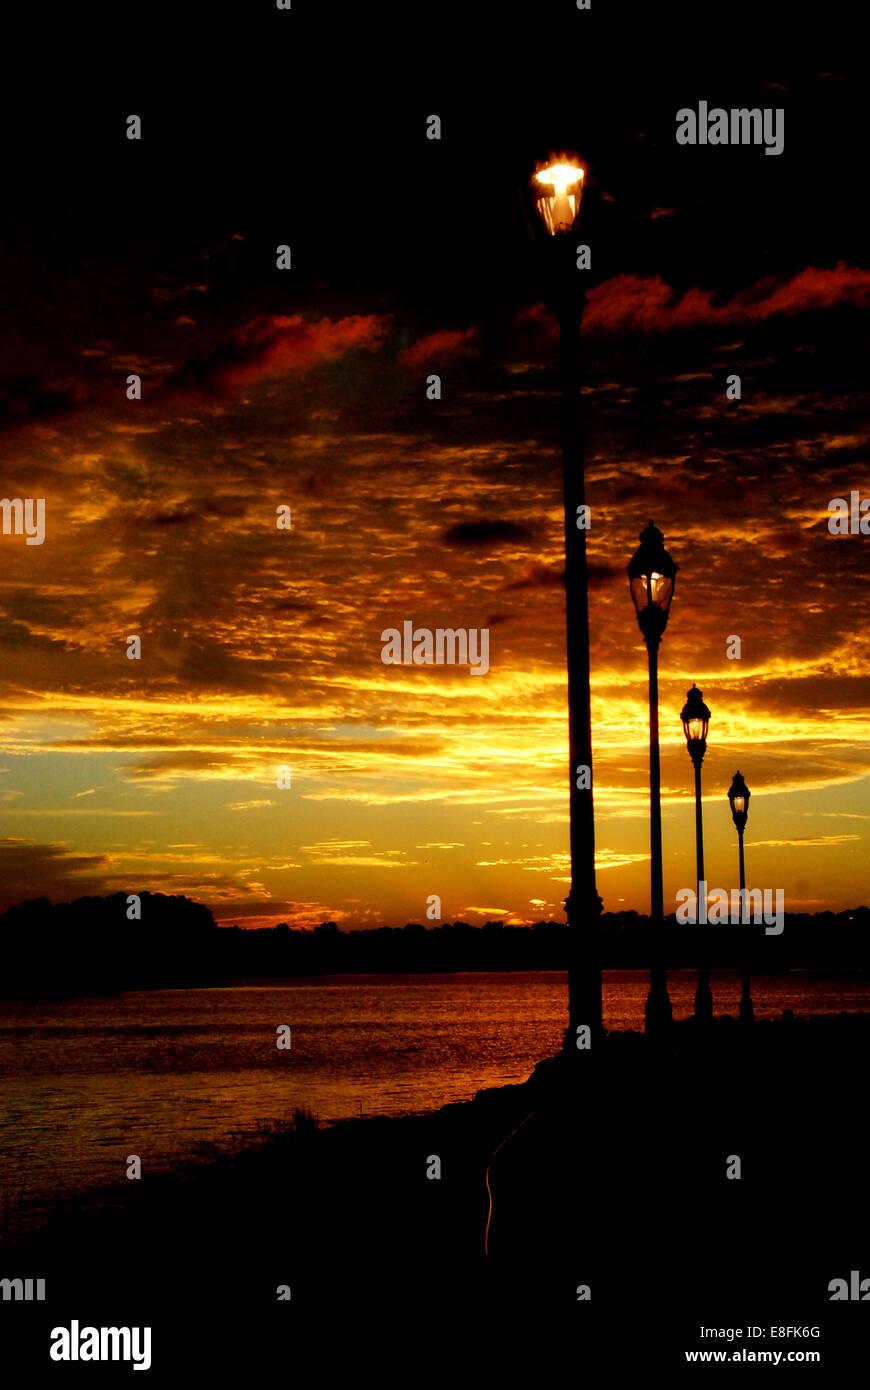 USA, Florida, Orlando, Orange County, Sonnenuntergang entlang zu Fuß Weg Stockbild